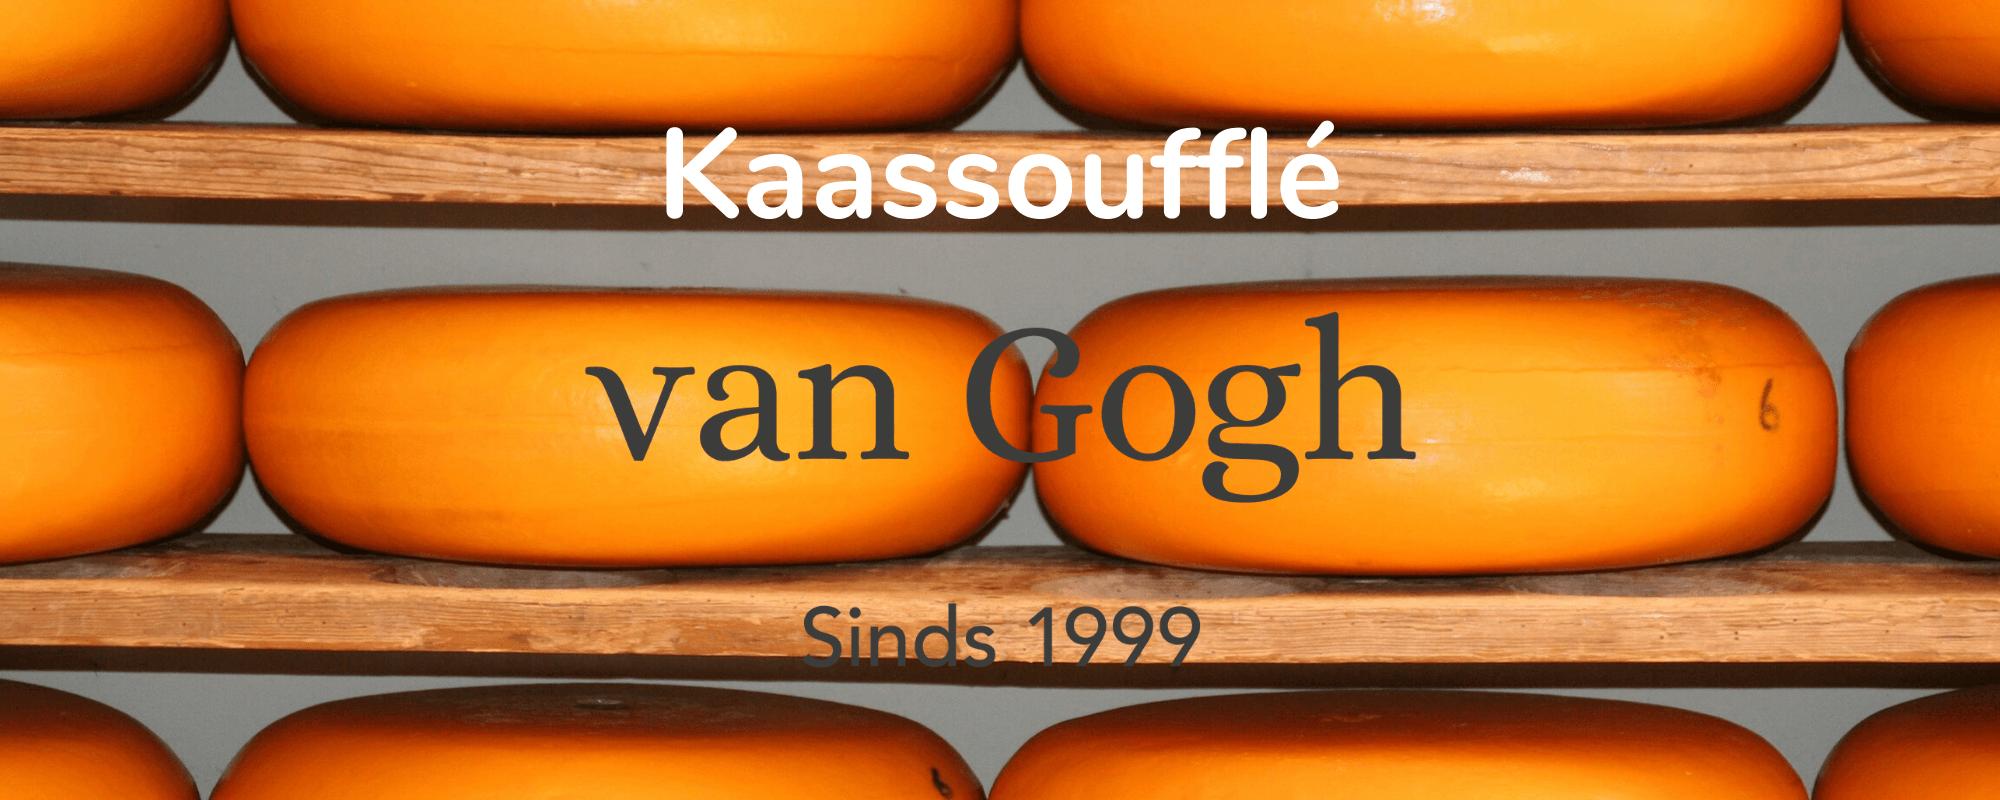 Kaassouffle